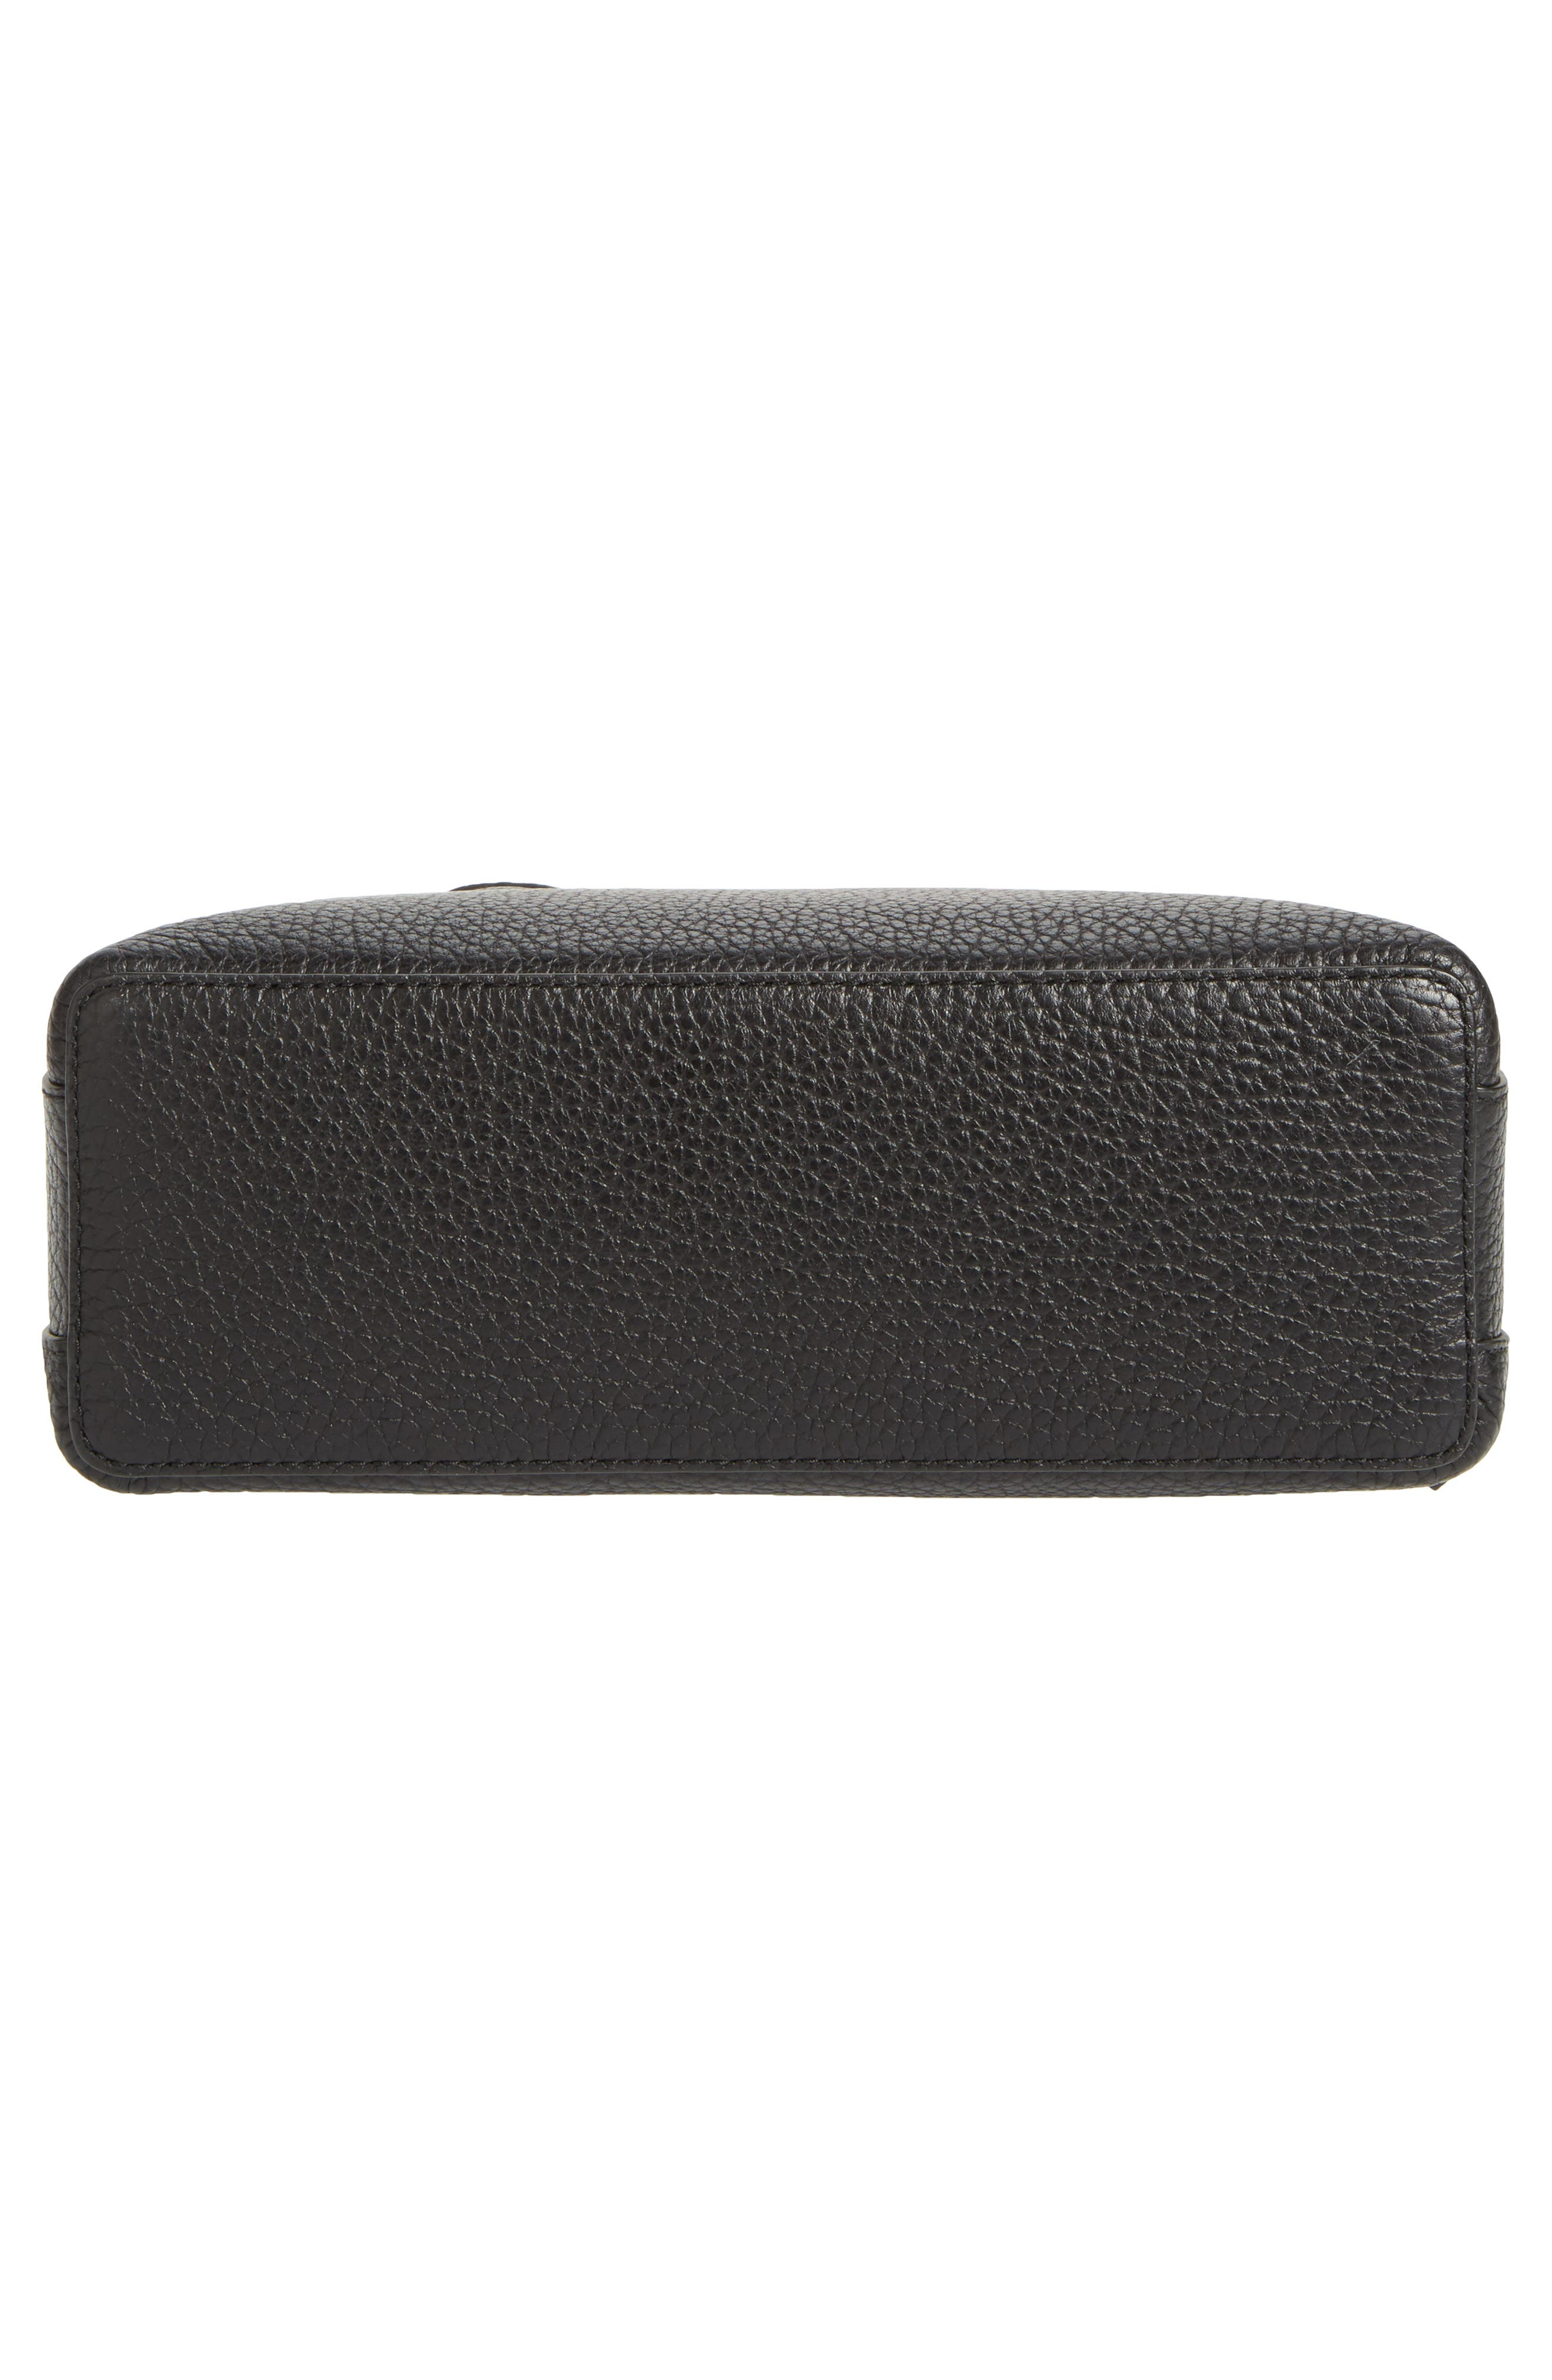 carter street - small ashleigh leather satchel,                             Alternate thumbnail 6, color,                             001